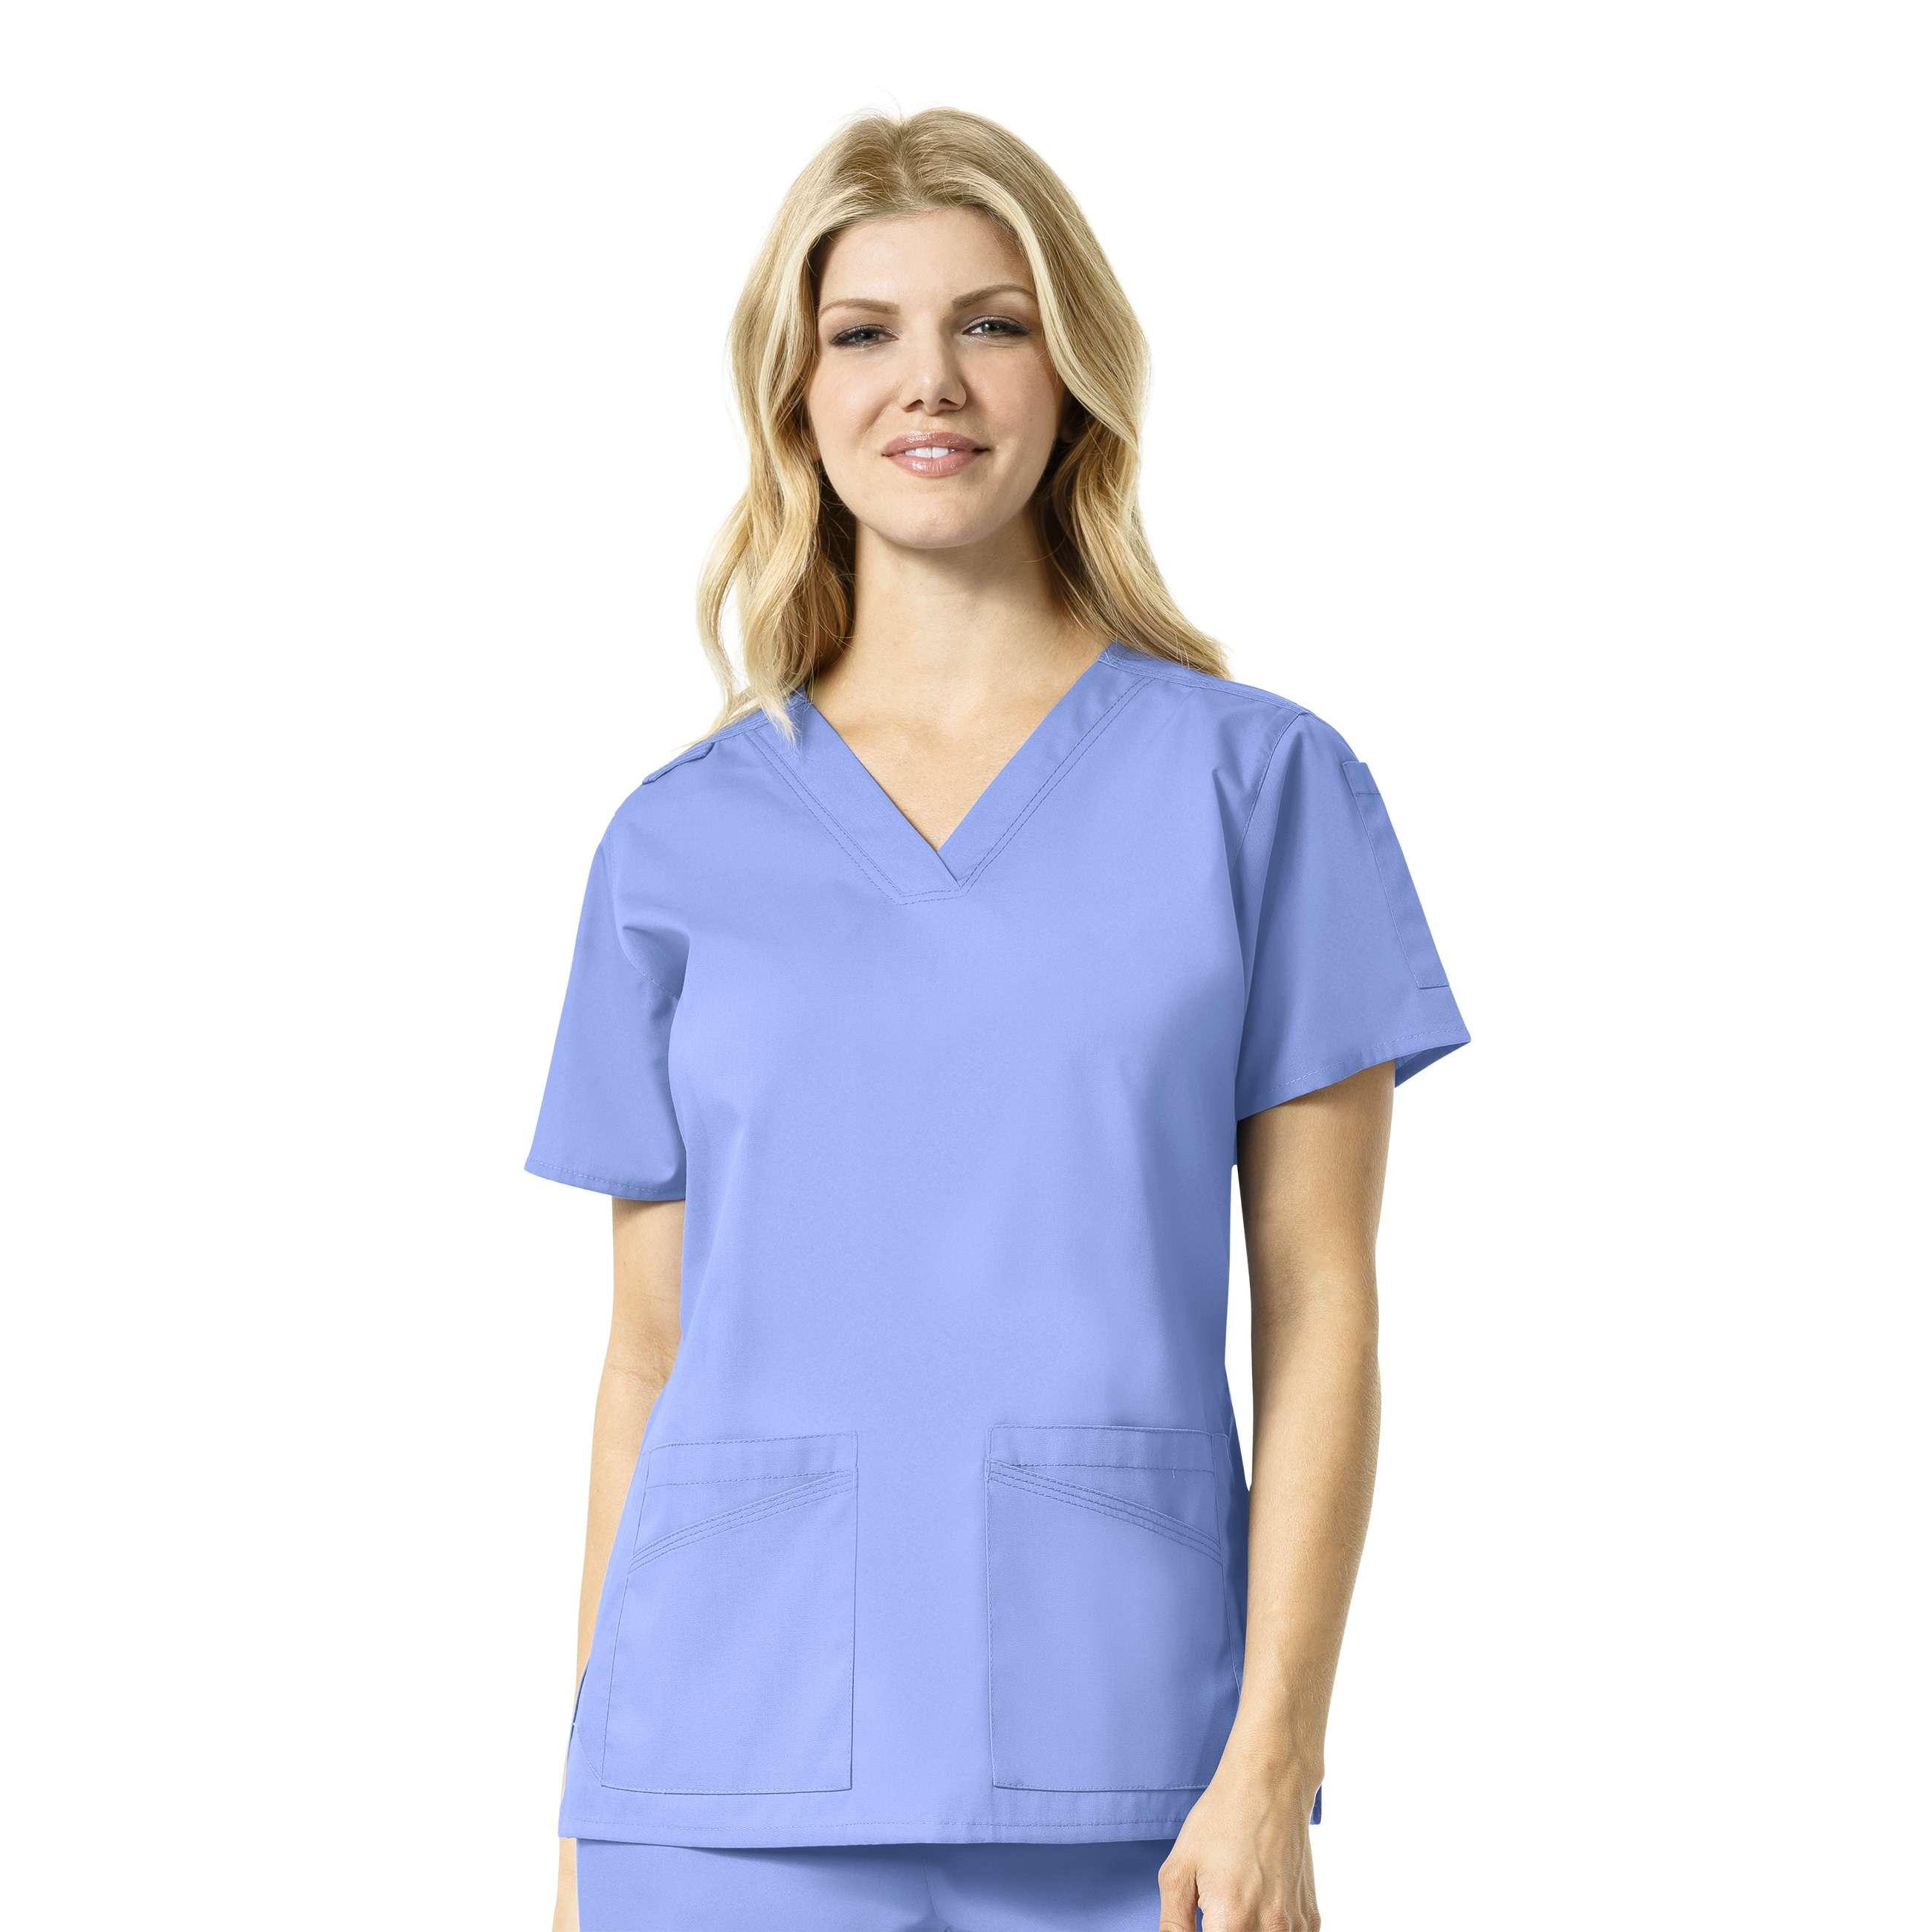 Carhartt Women's V-neck Multi Pocket Top